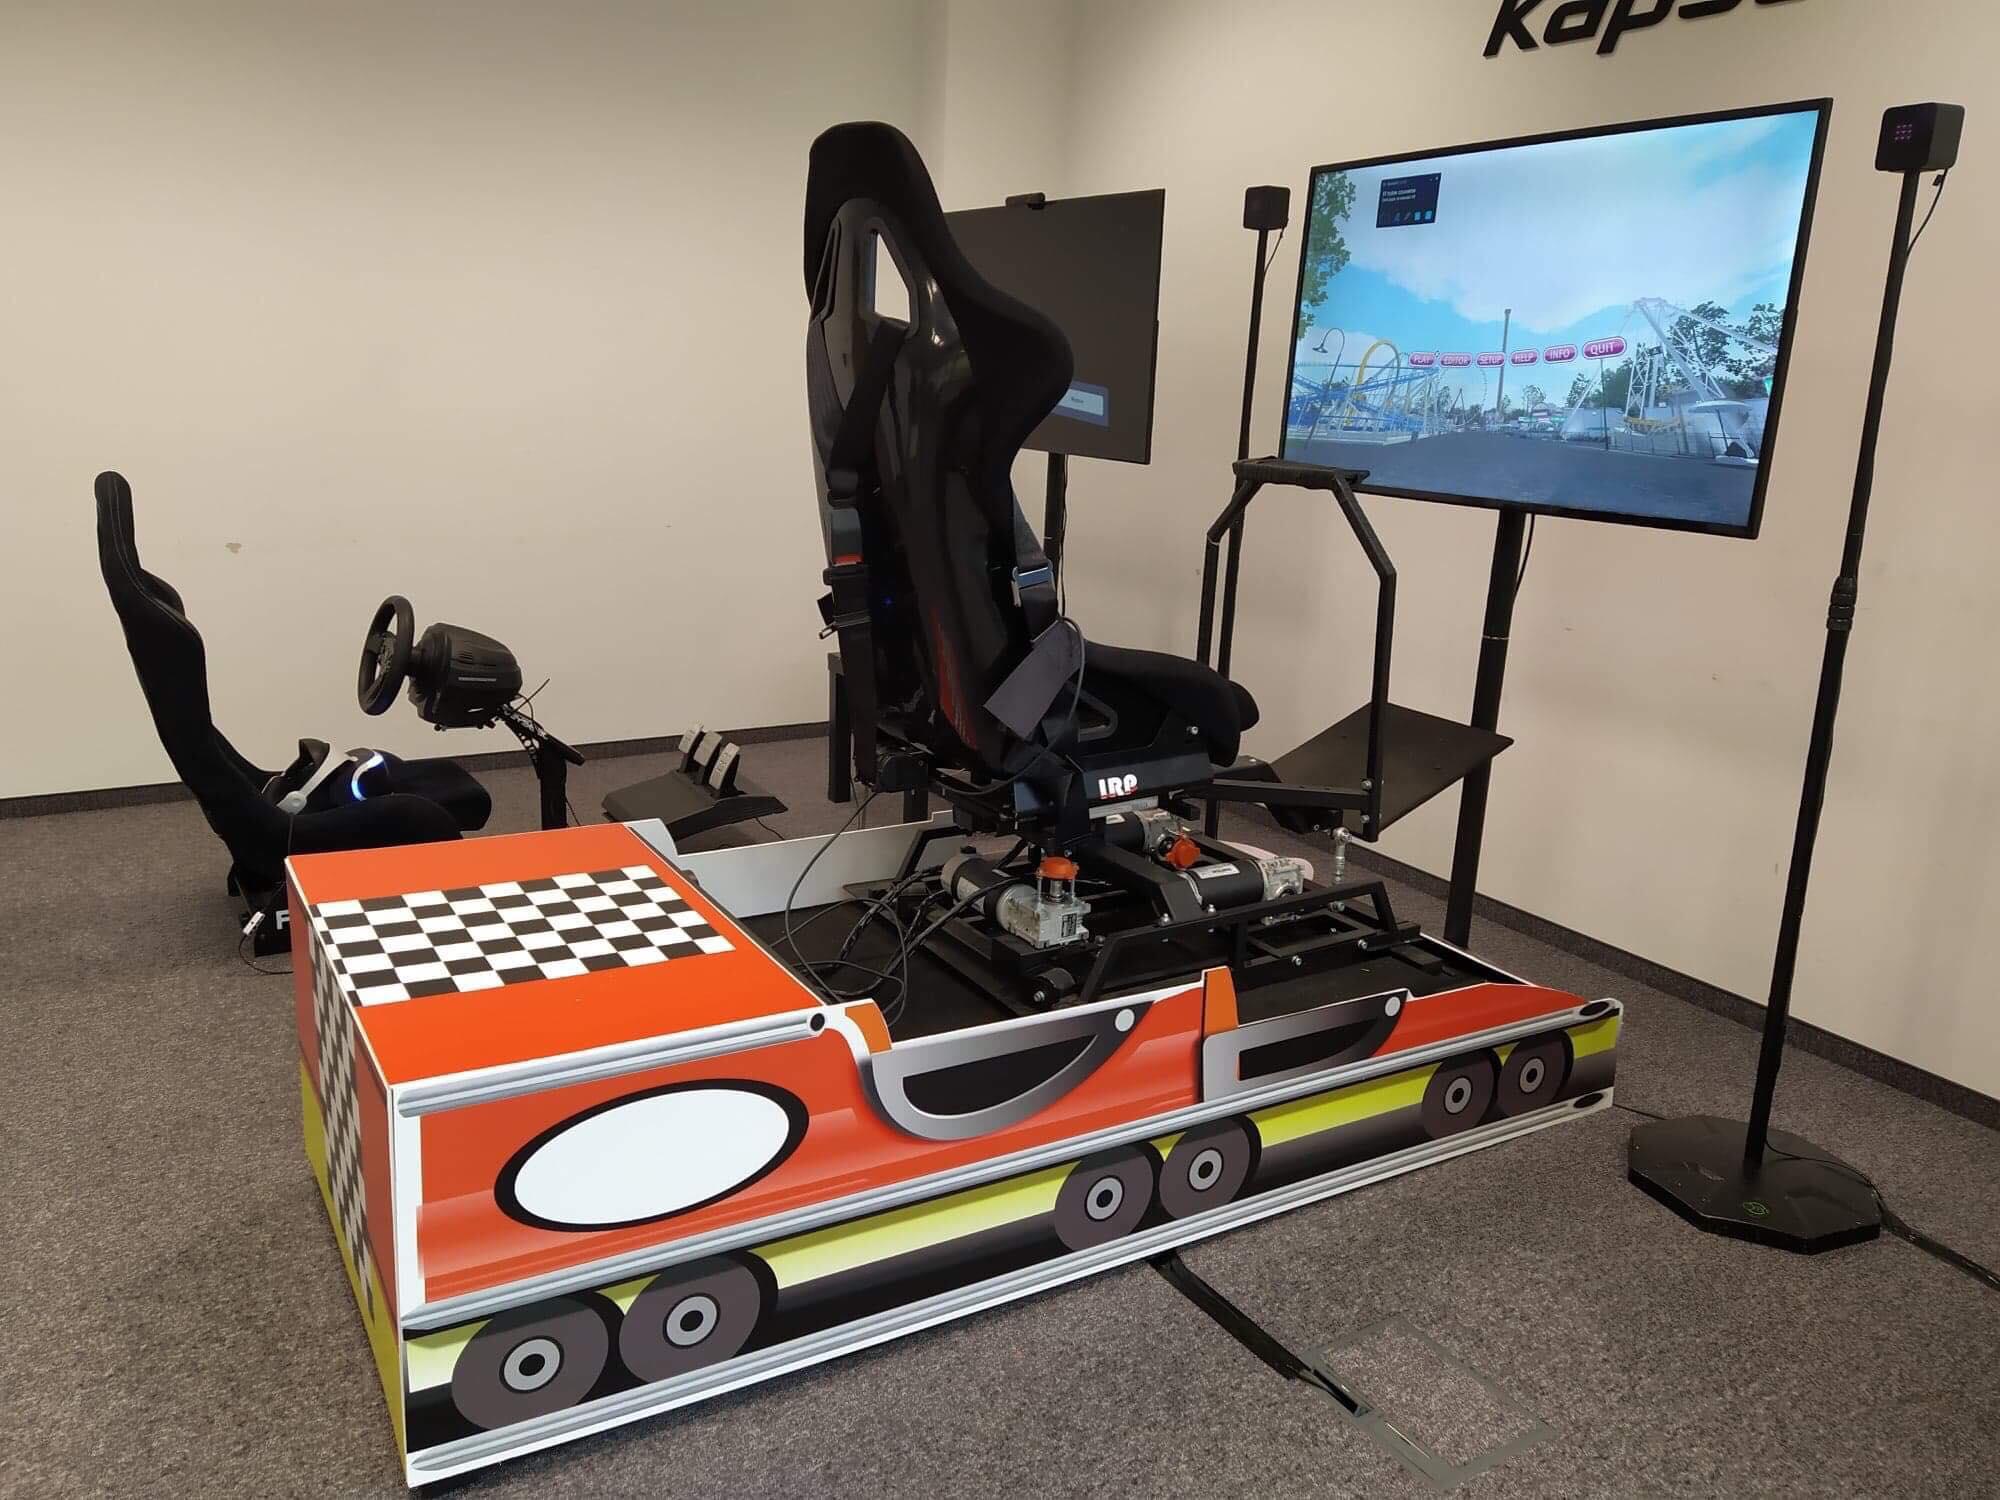 Symulator rollercoaster do wynajęcia na event